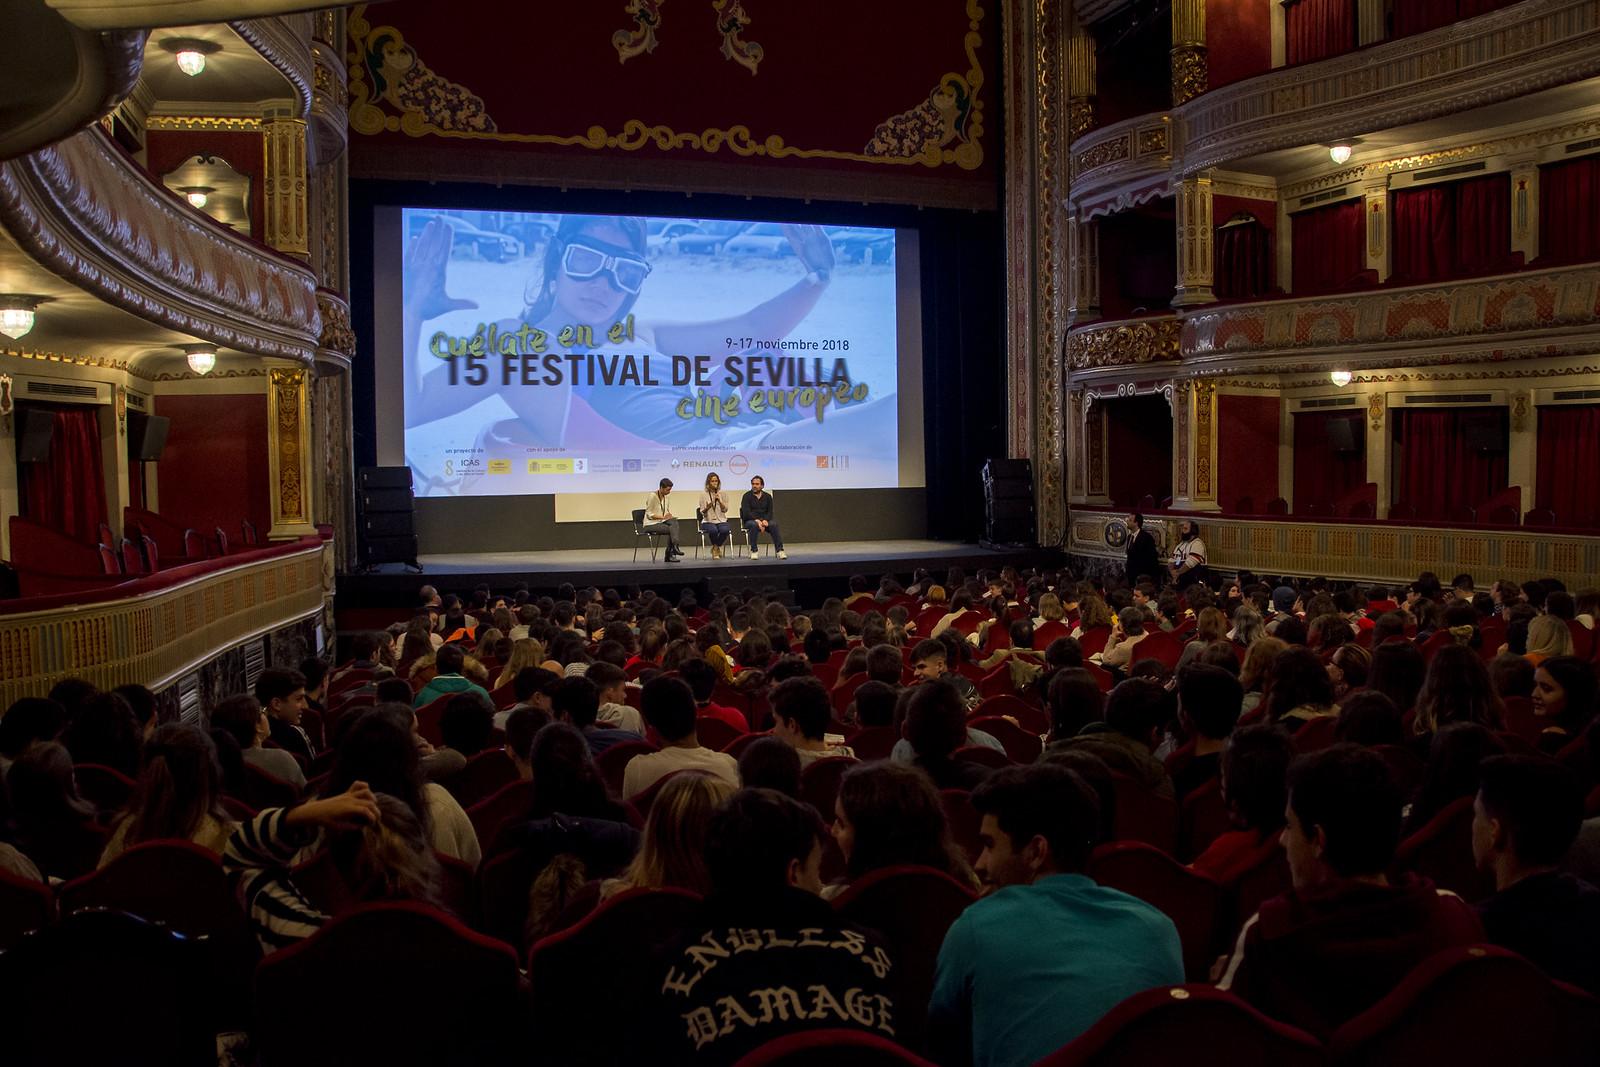 Festival de Sevilla 2018